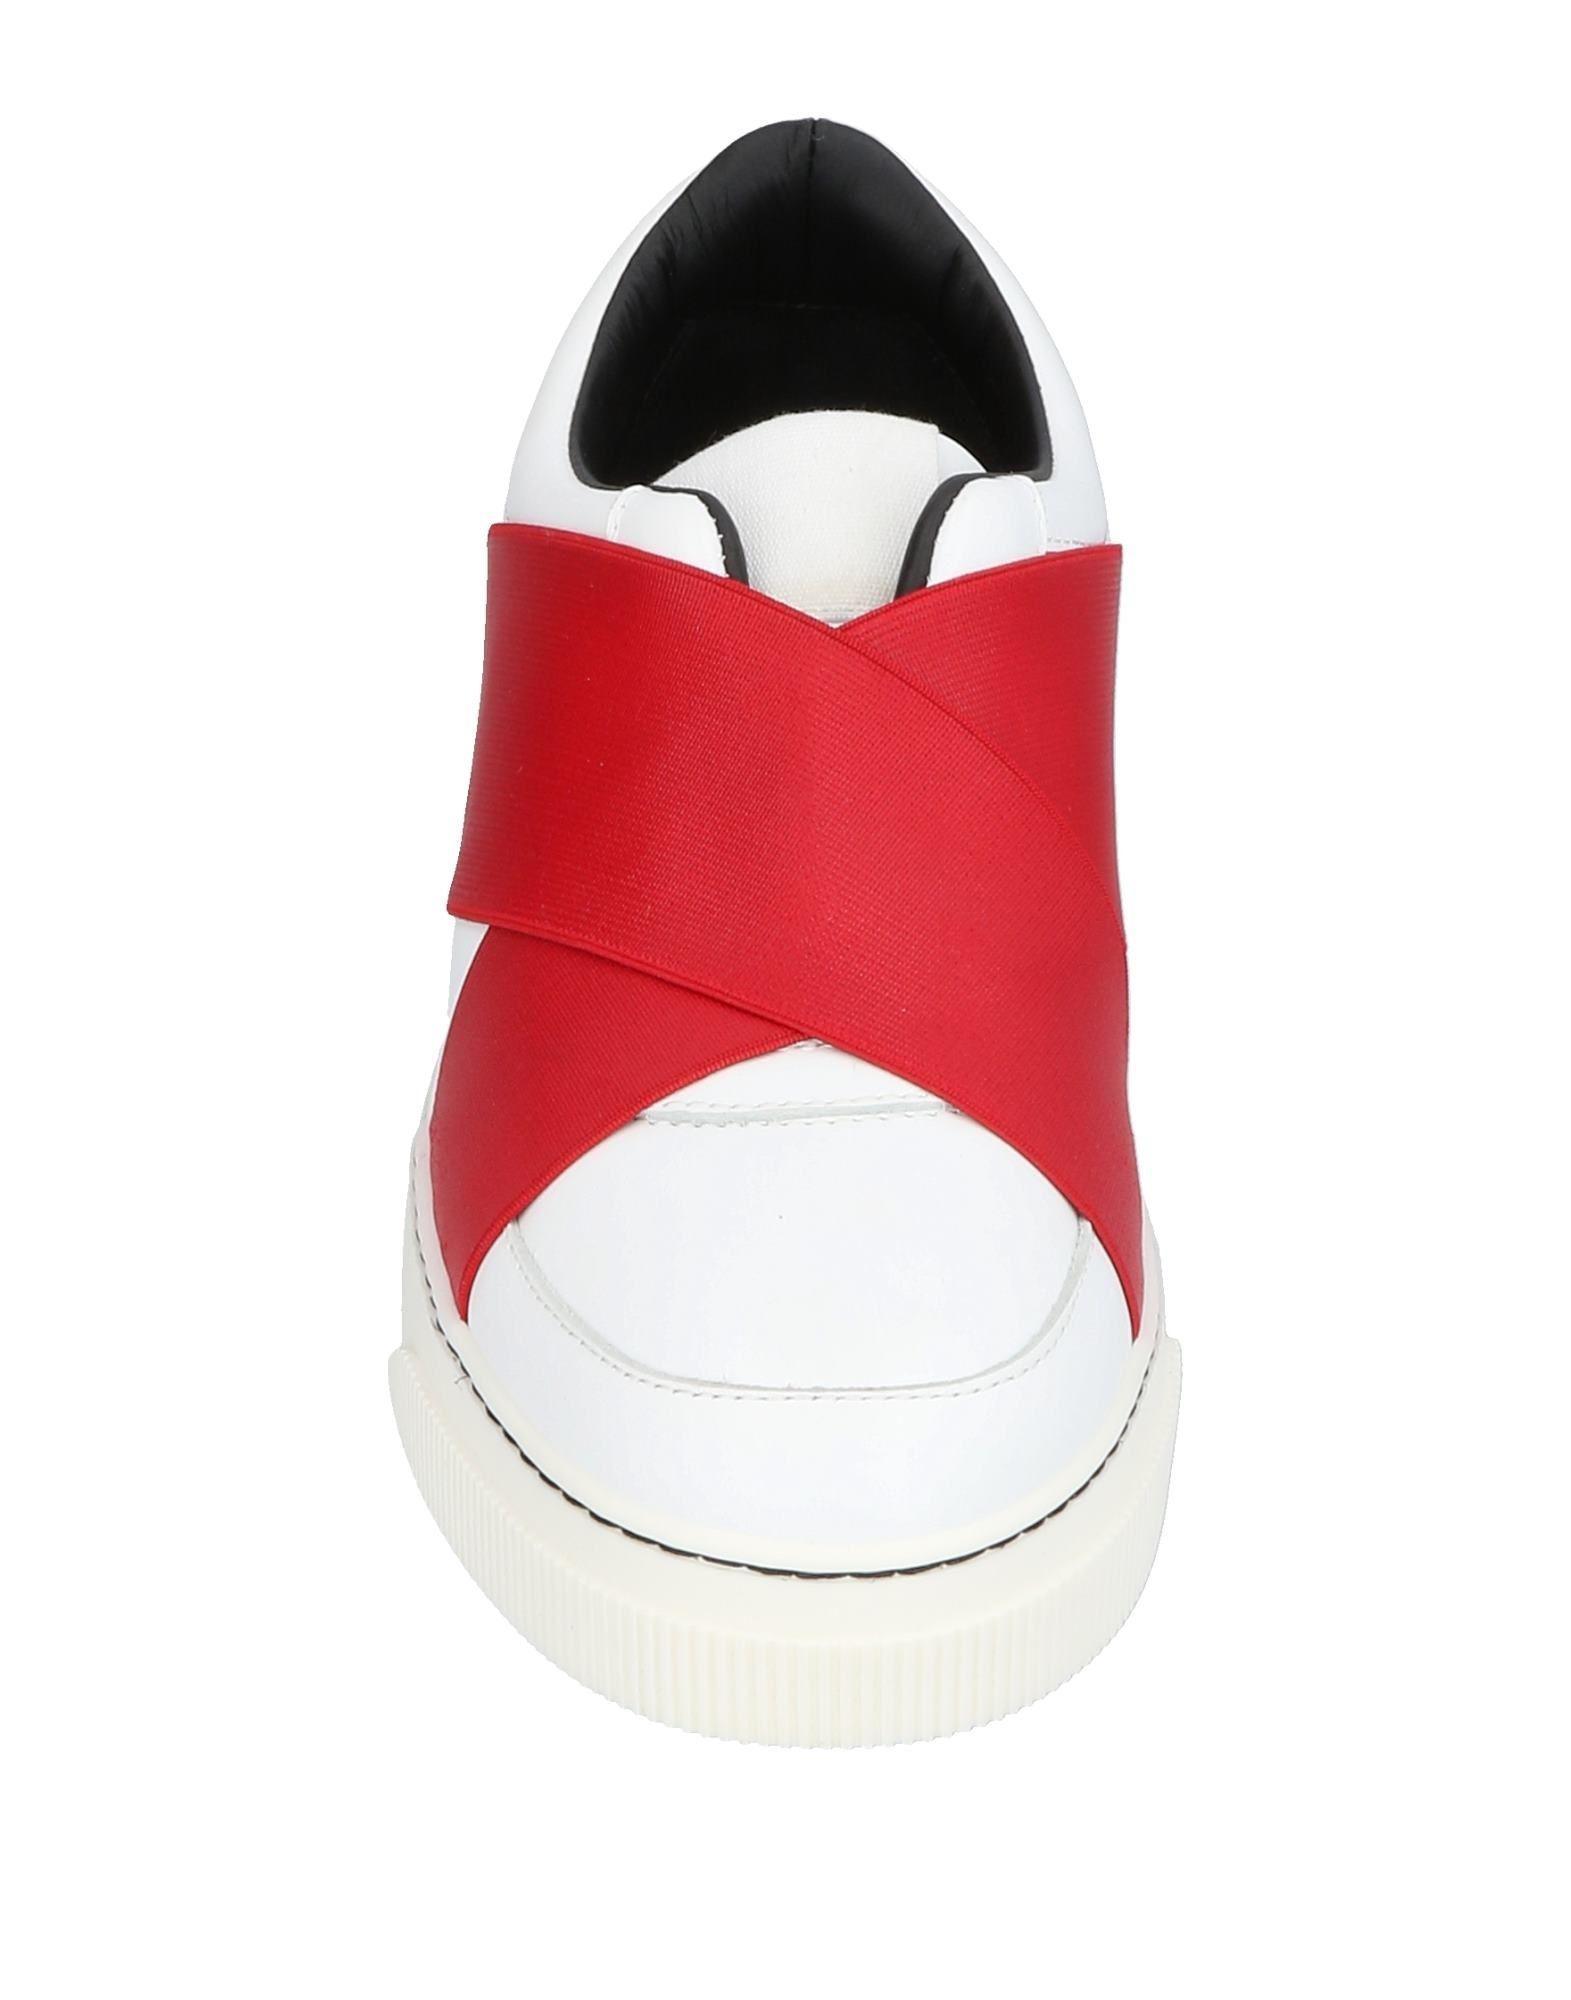 Proenza Schouler Leather Low-tops & Sneakers in Red